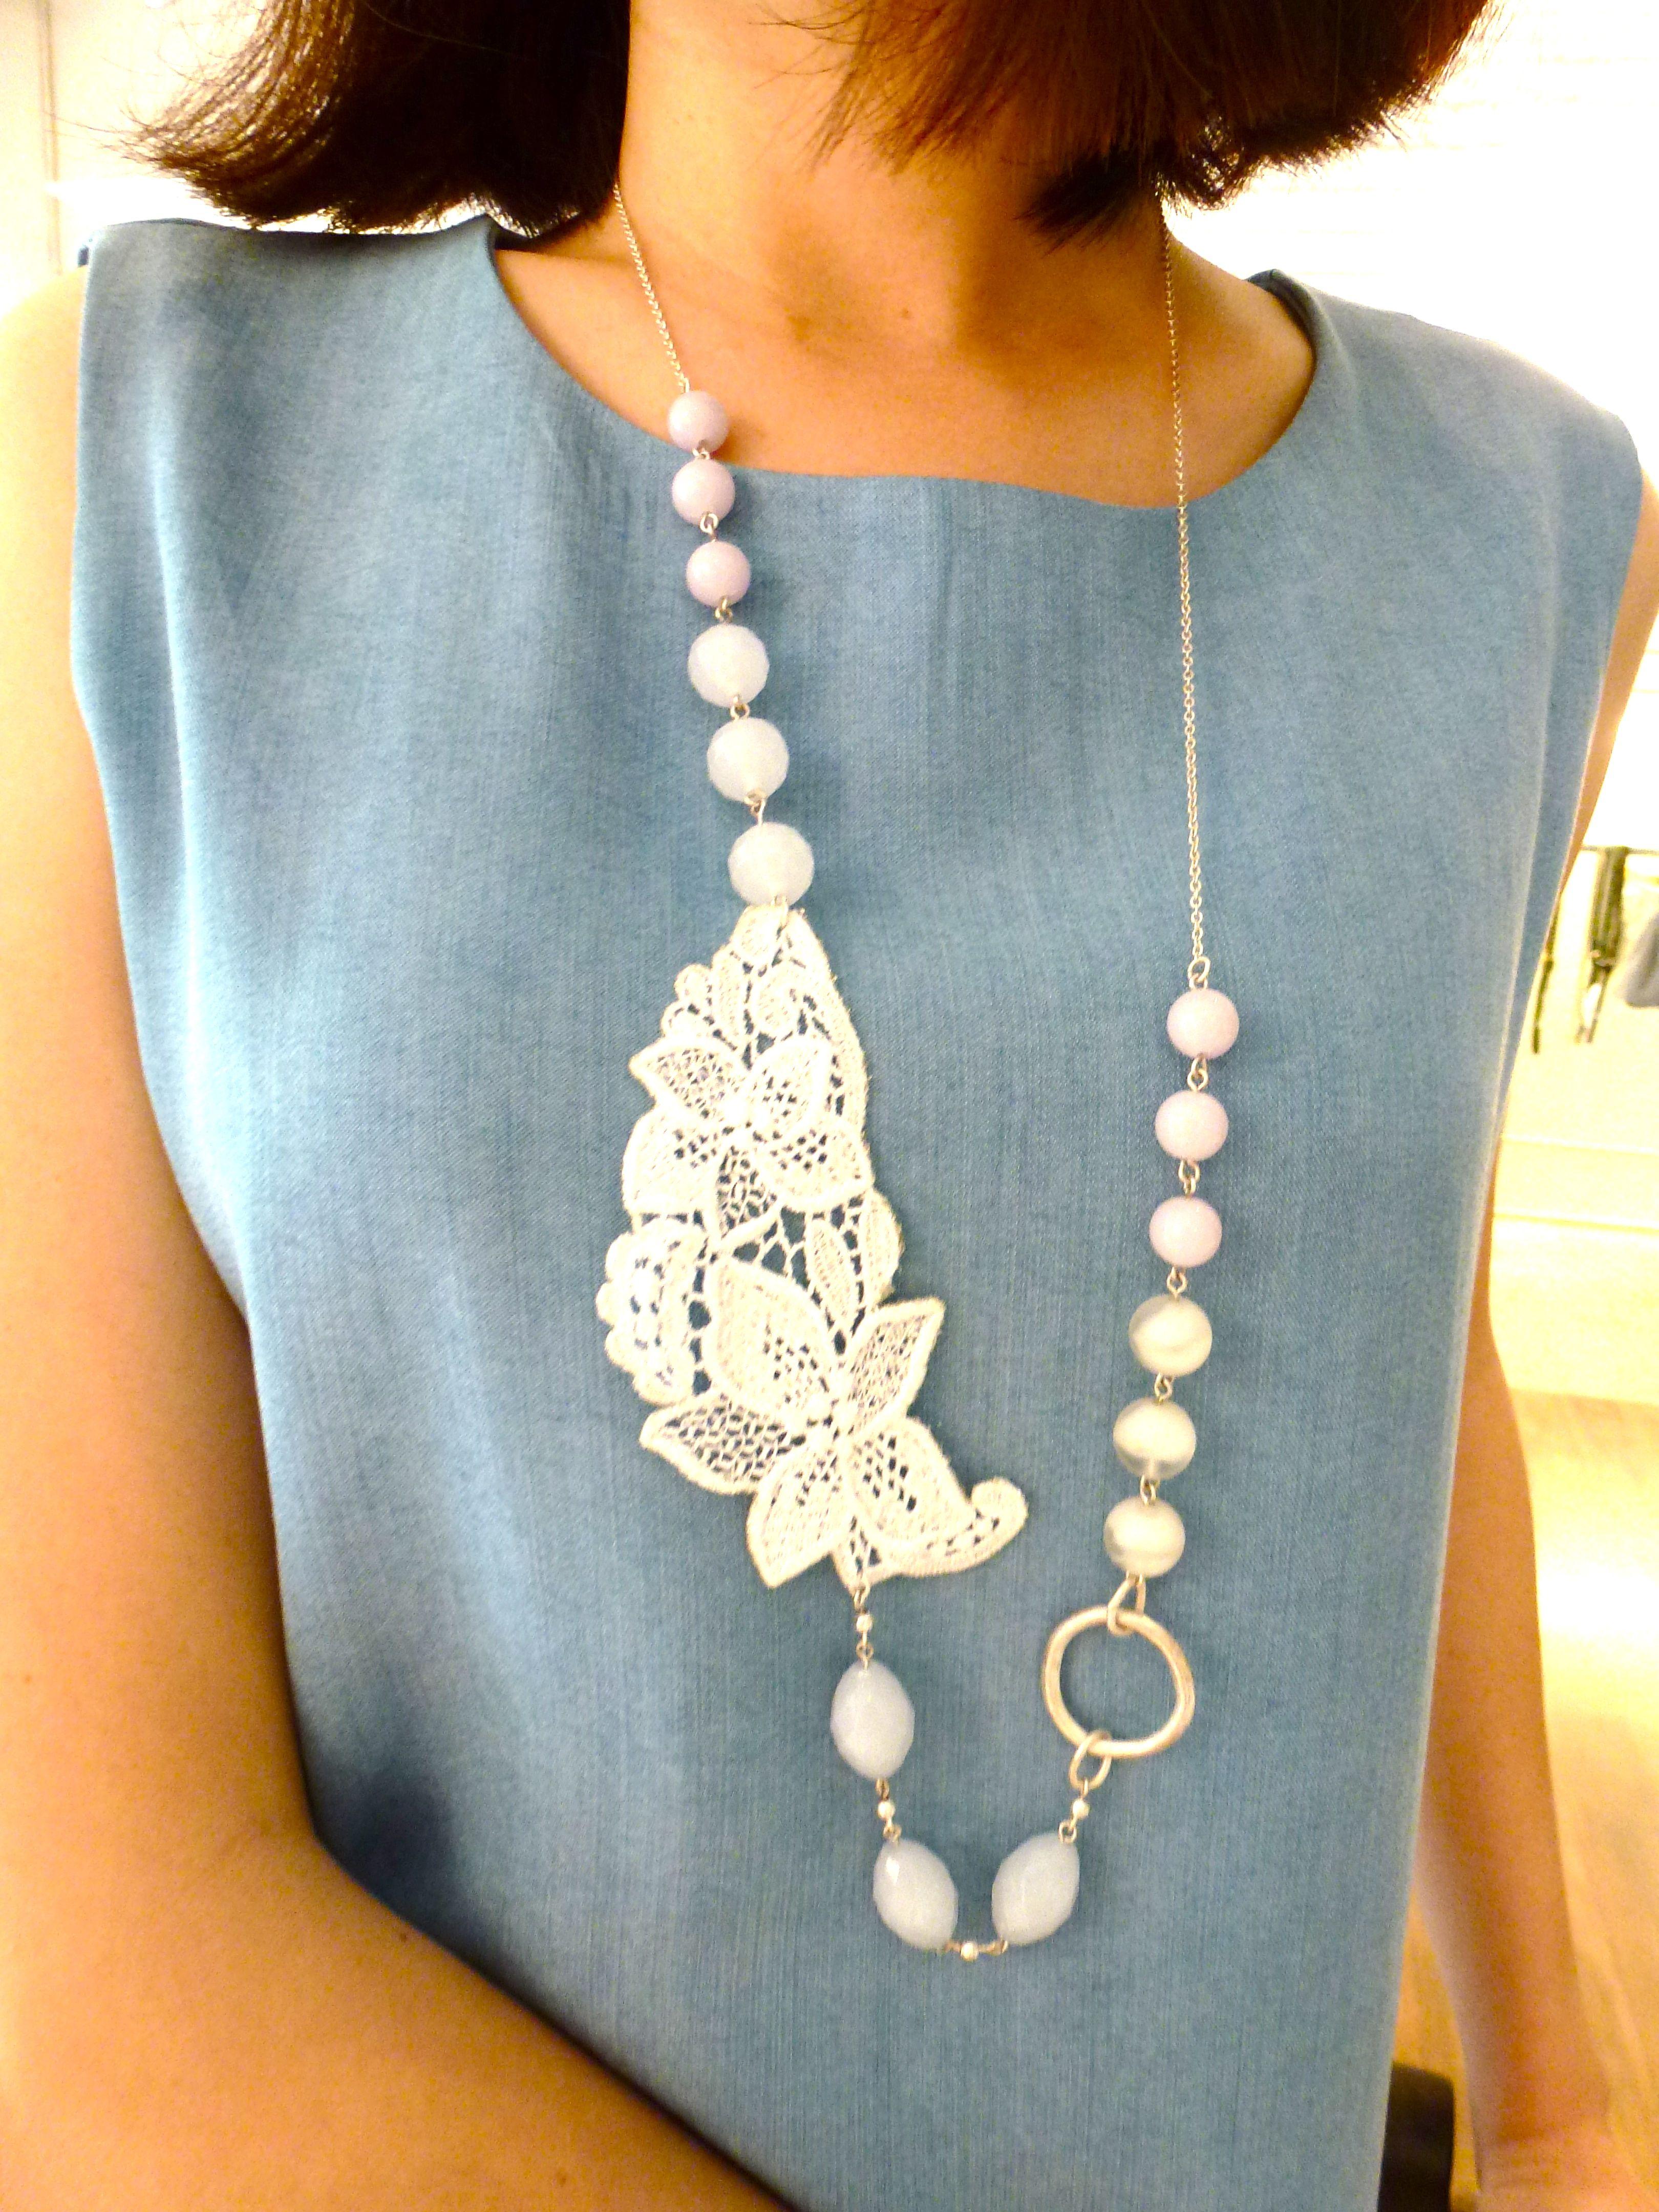 denim + lace + stone = elegance